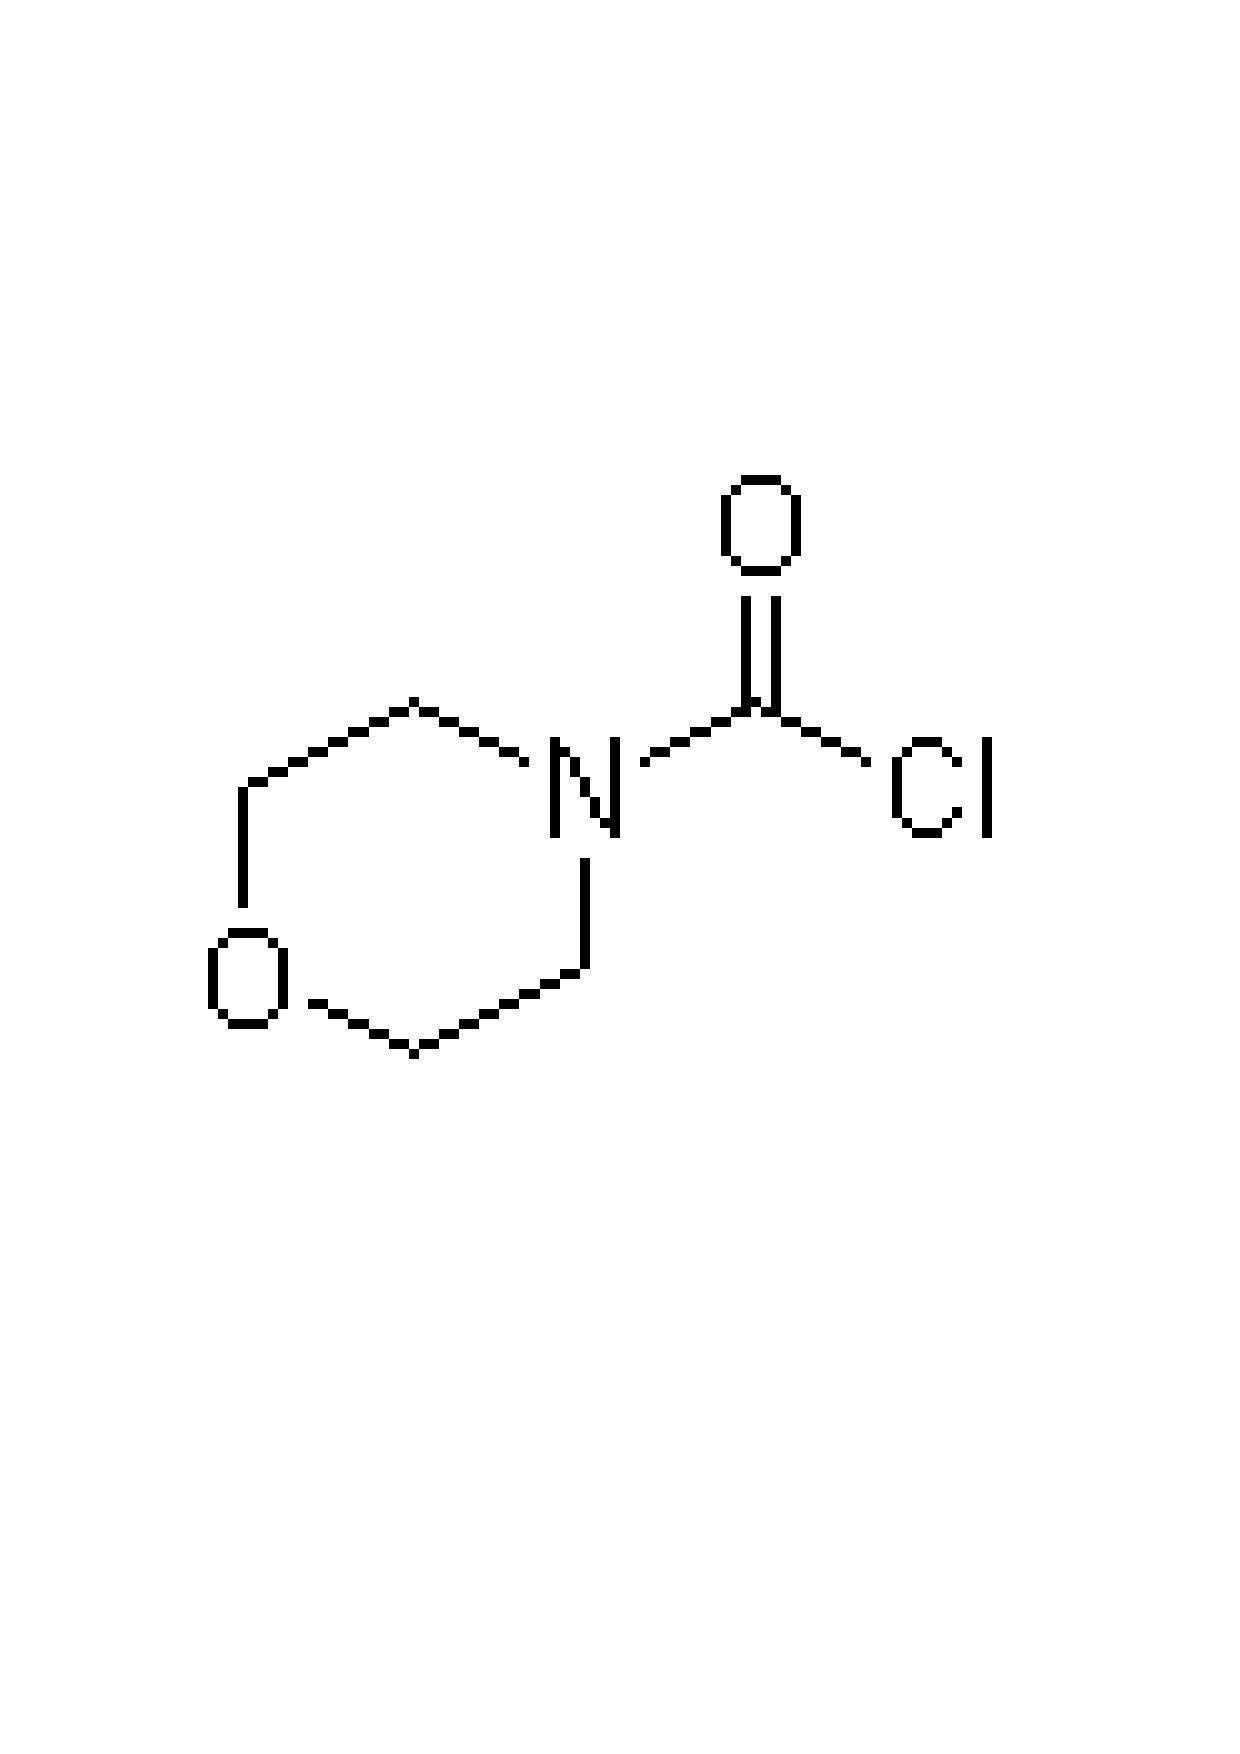 4-Morpholinecarbonyl chloride